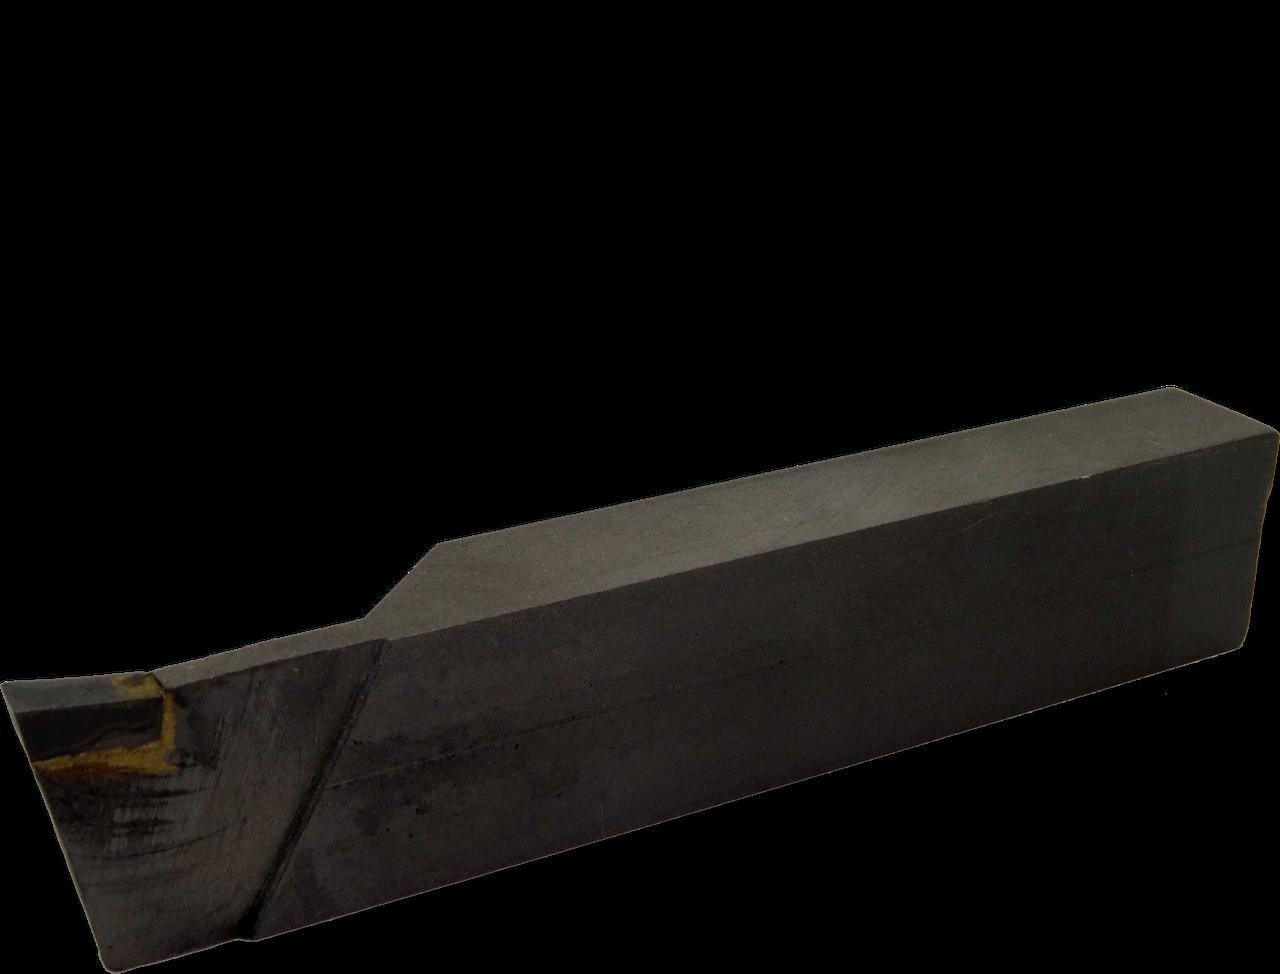 Резец 40х25х200 (Т5К10) отрезной токарный СИТО Беларусь